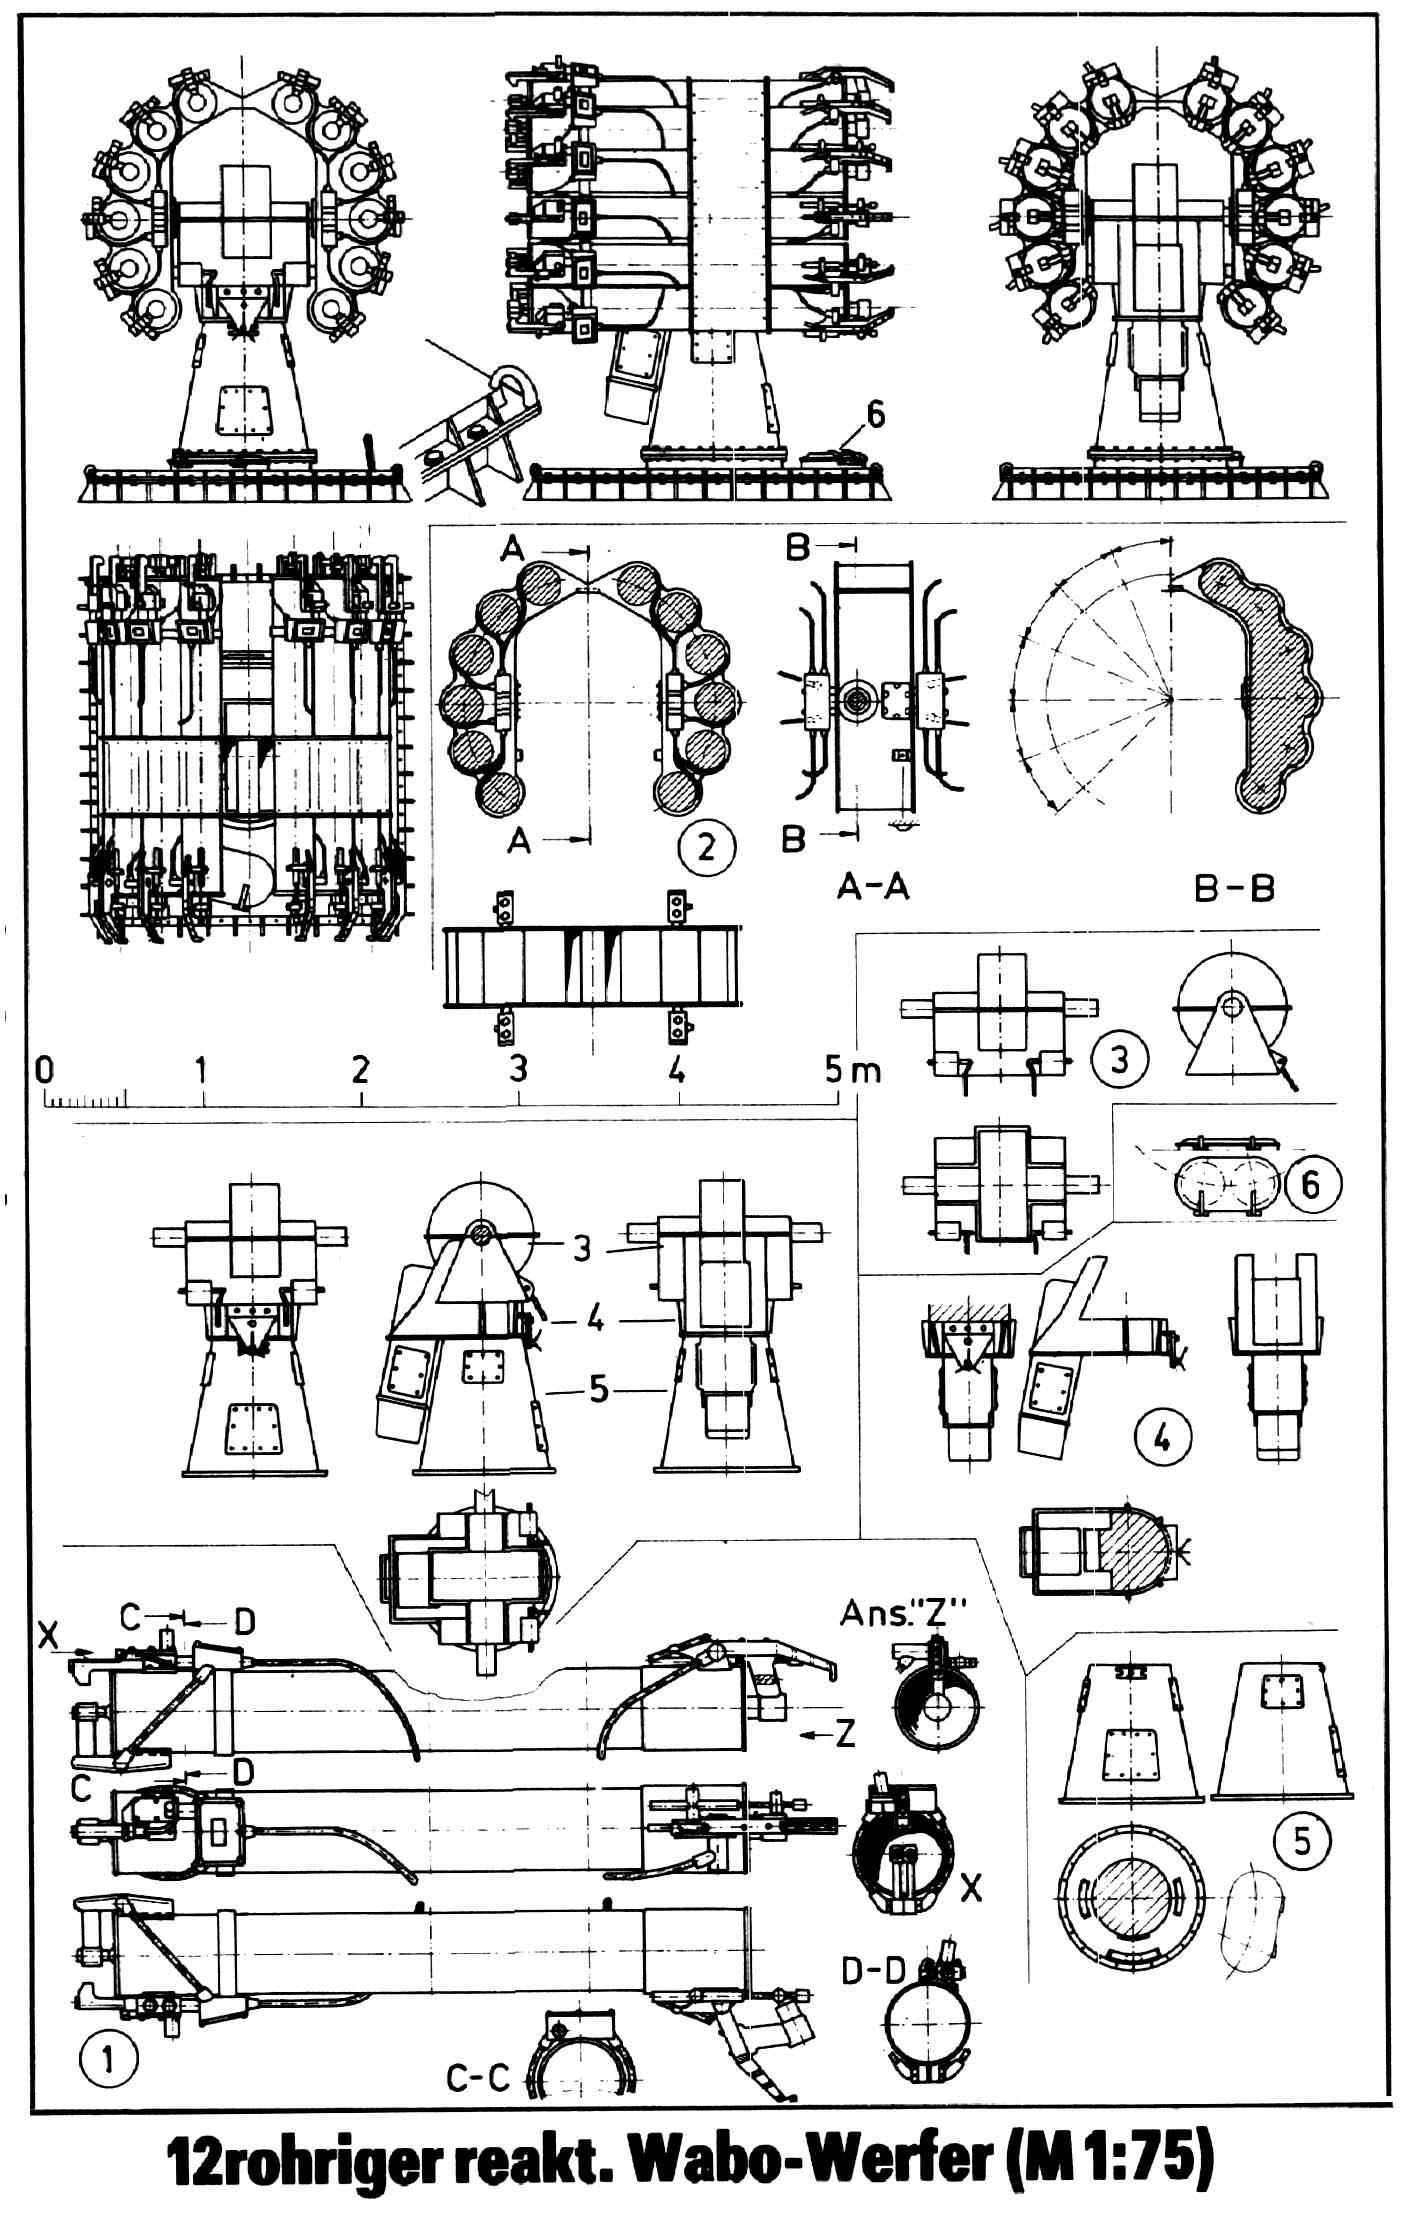 rbu-600.jpg